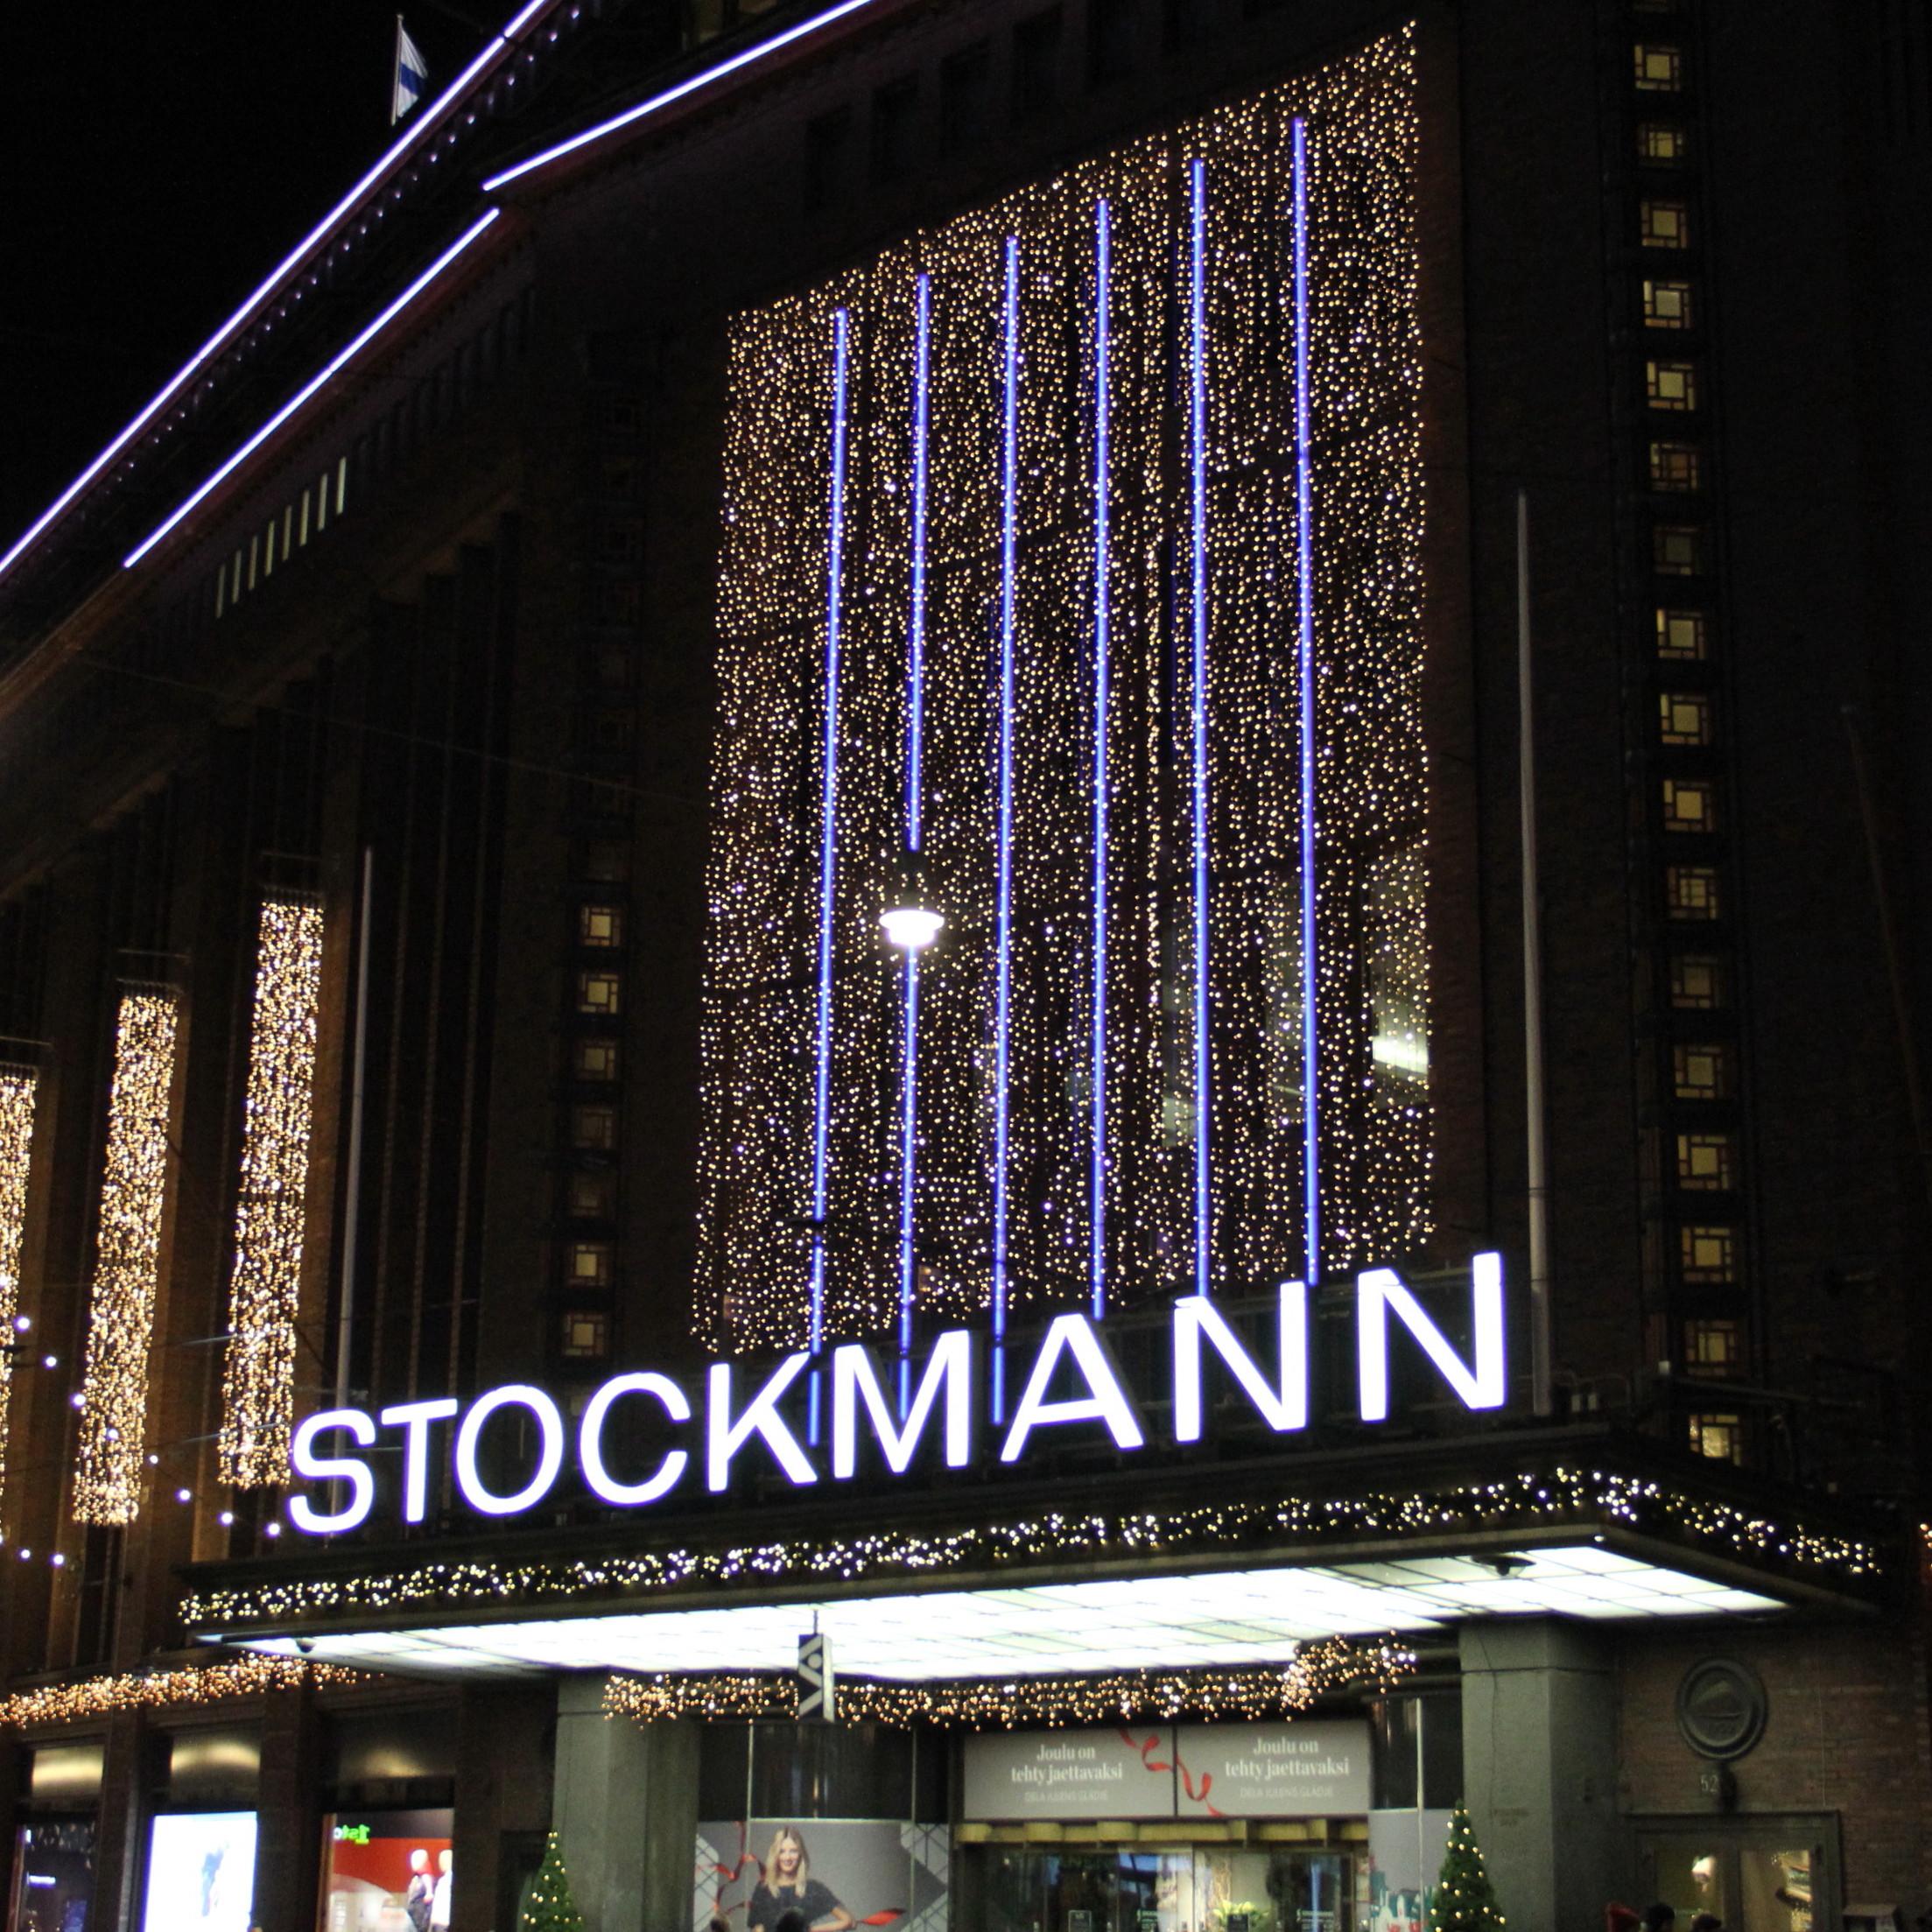 joulu stockmann 2018 File:Suomi100 Stockmann Helsinki.   Wikimedia Commons joulu stockmann 2018